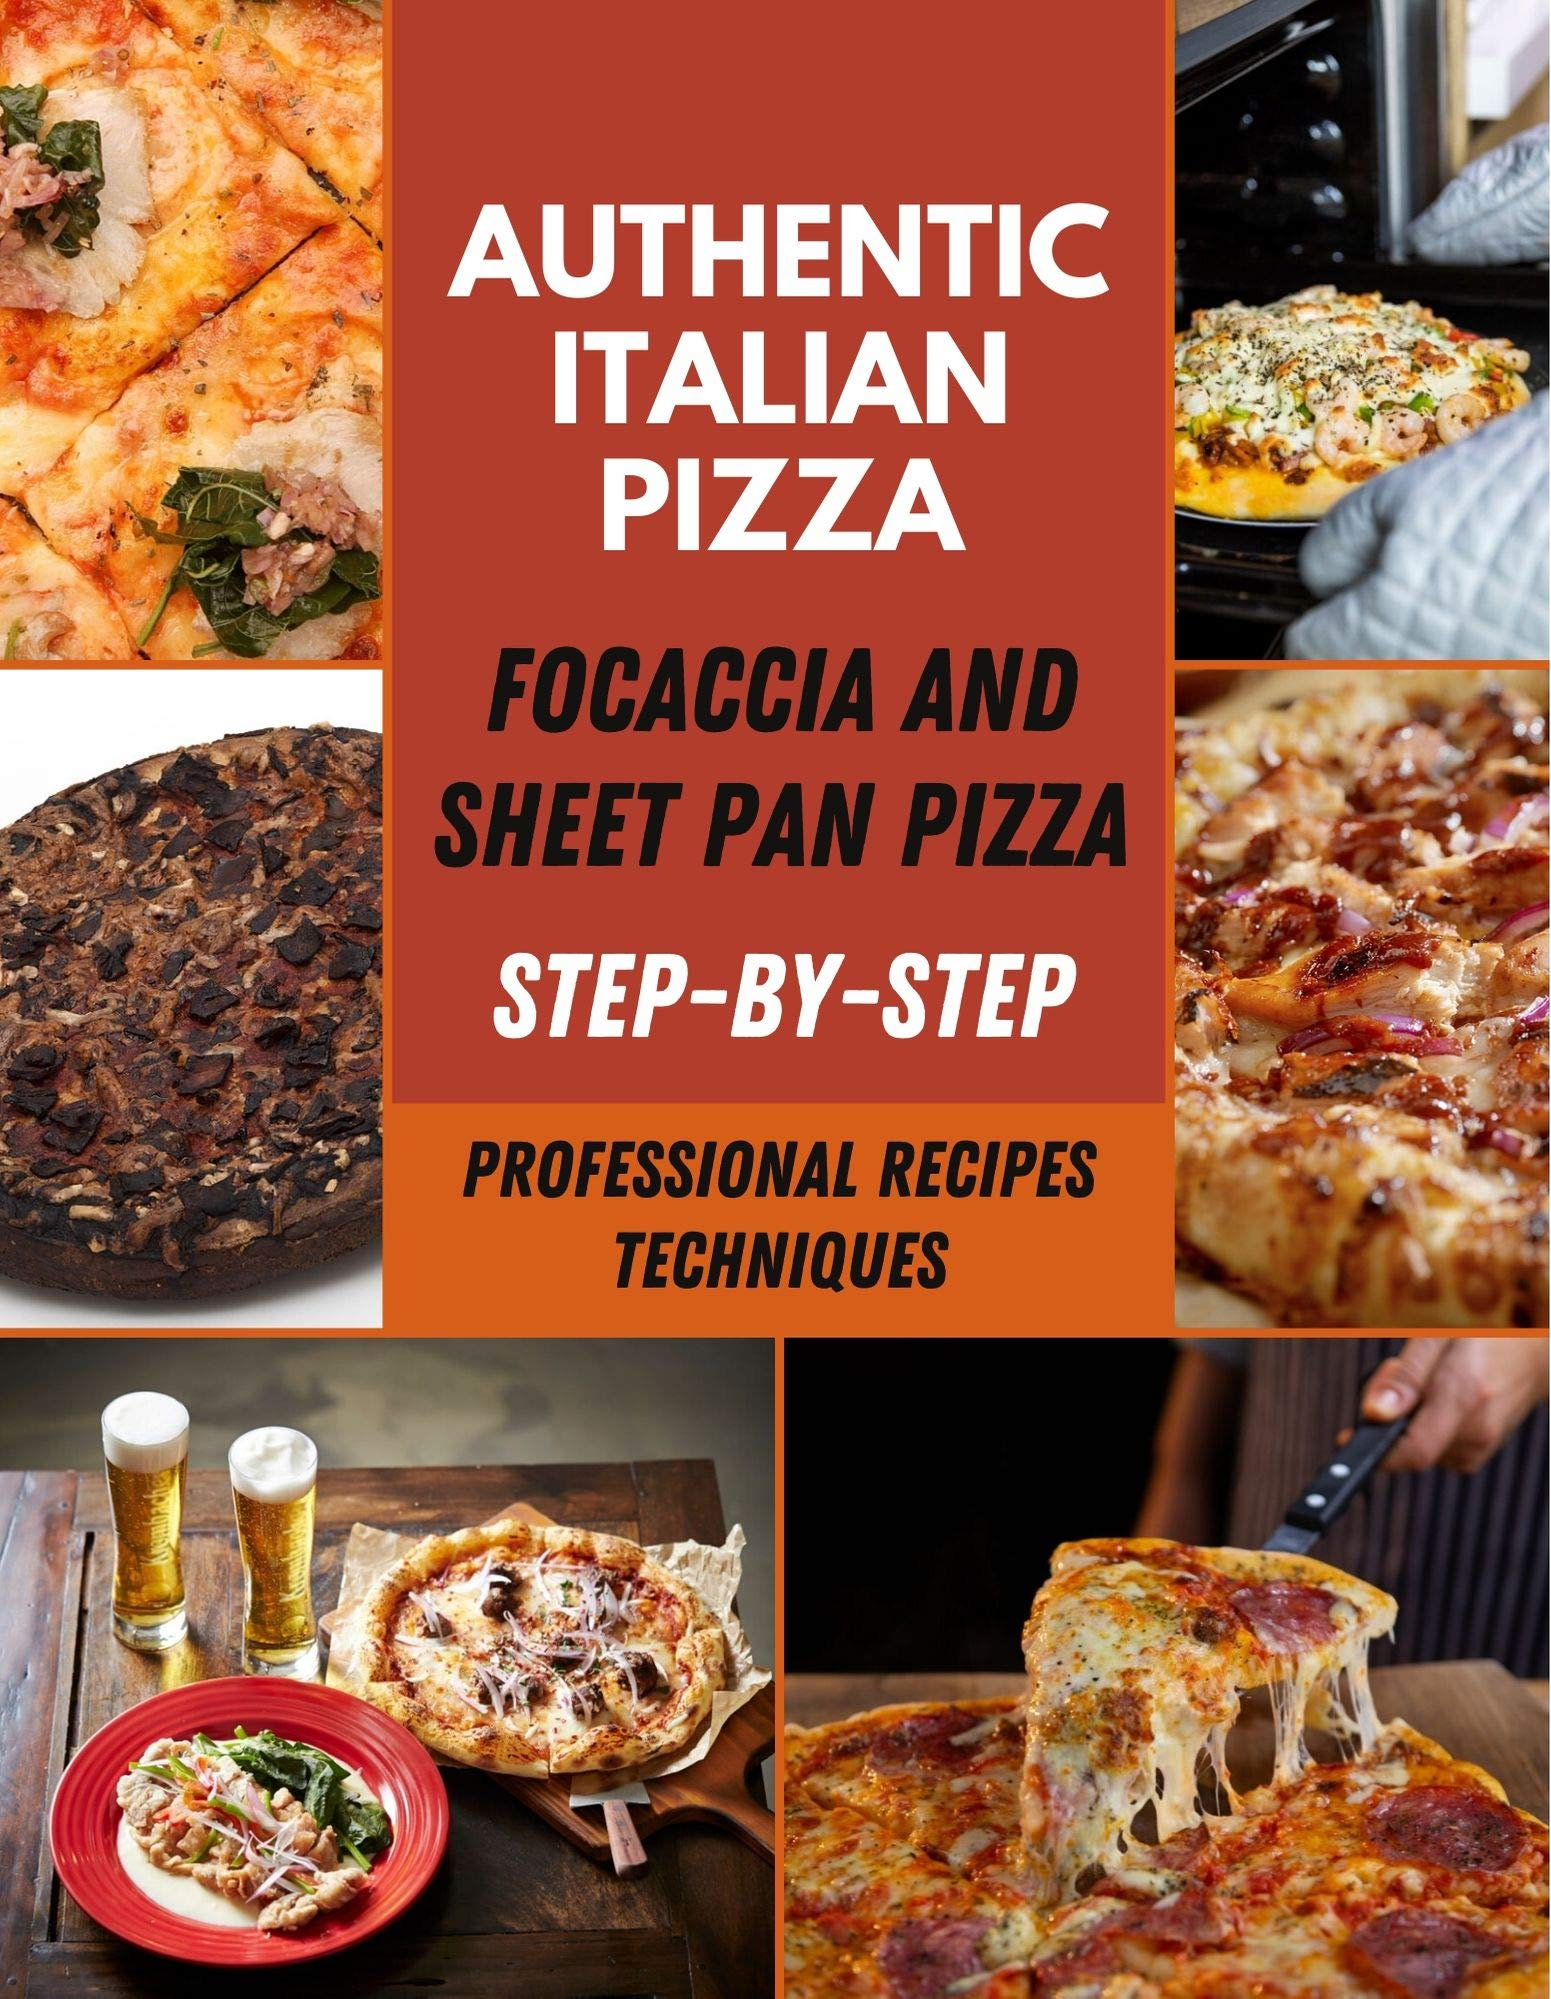 Authentic Italian Pizza Cookbook: Professional & techniques recipes, Focaccia and sheet pan pizza For family recipes | Italian chefs Make Pizza, Pasta Lasagna, Chicken Parmesan, Meatballs